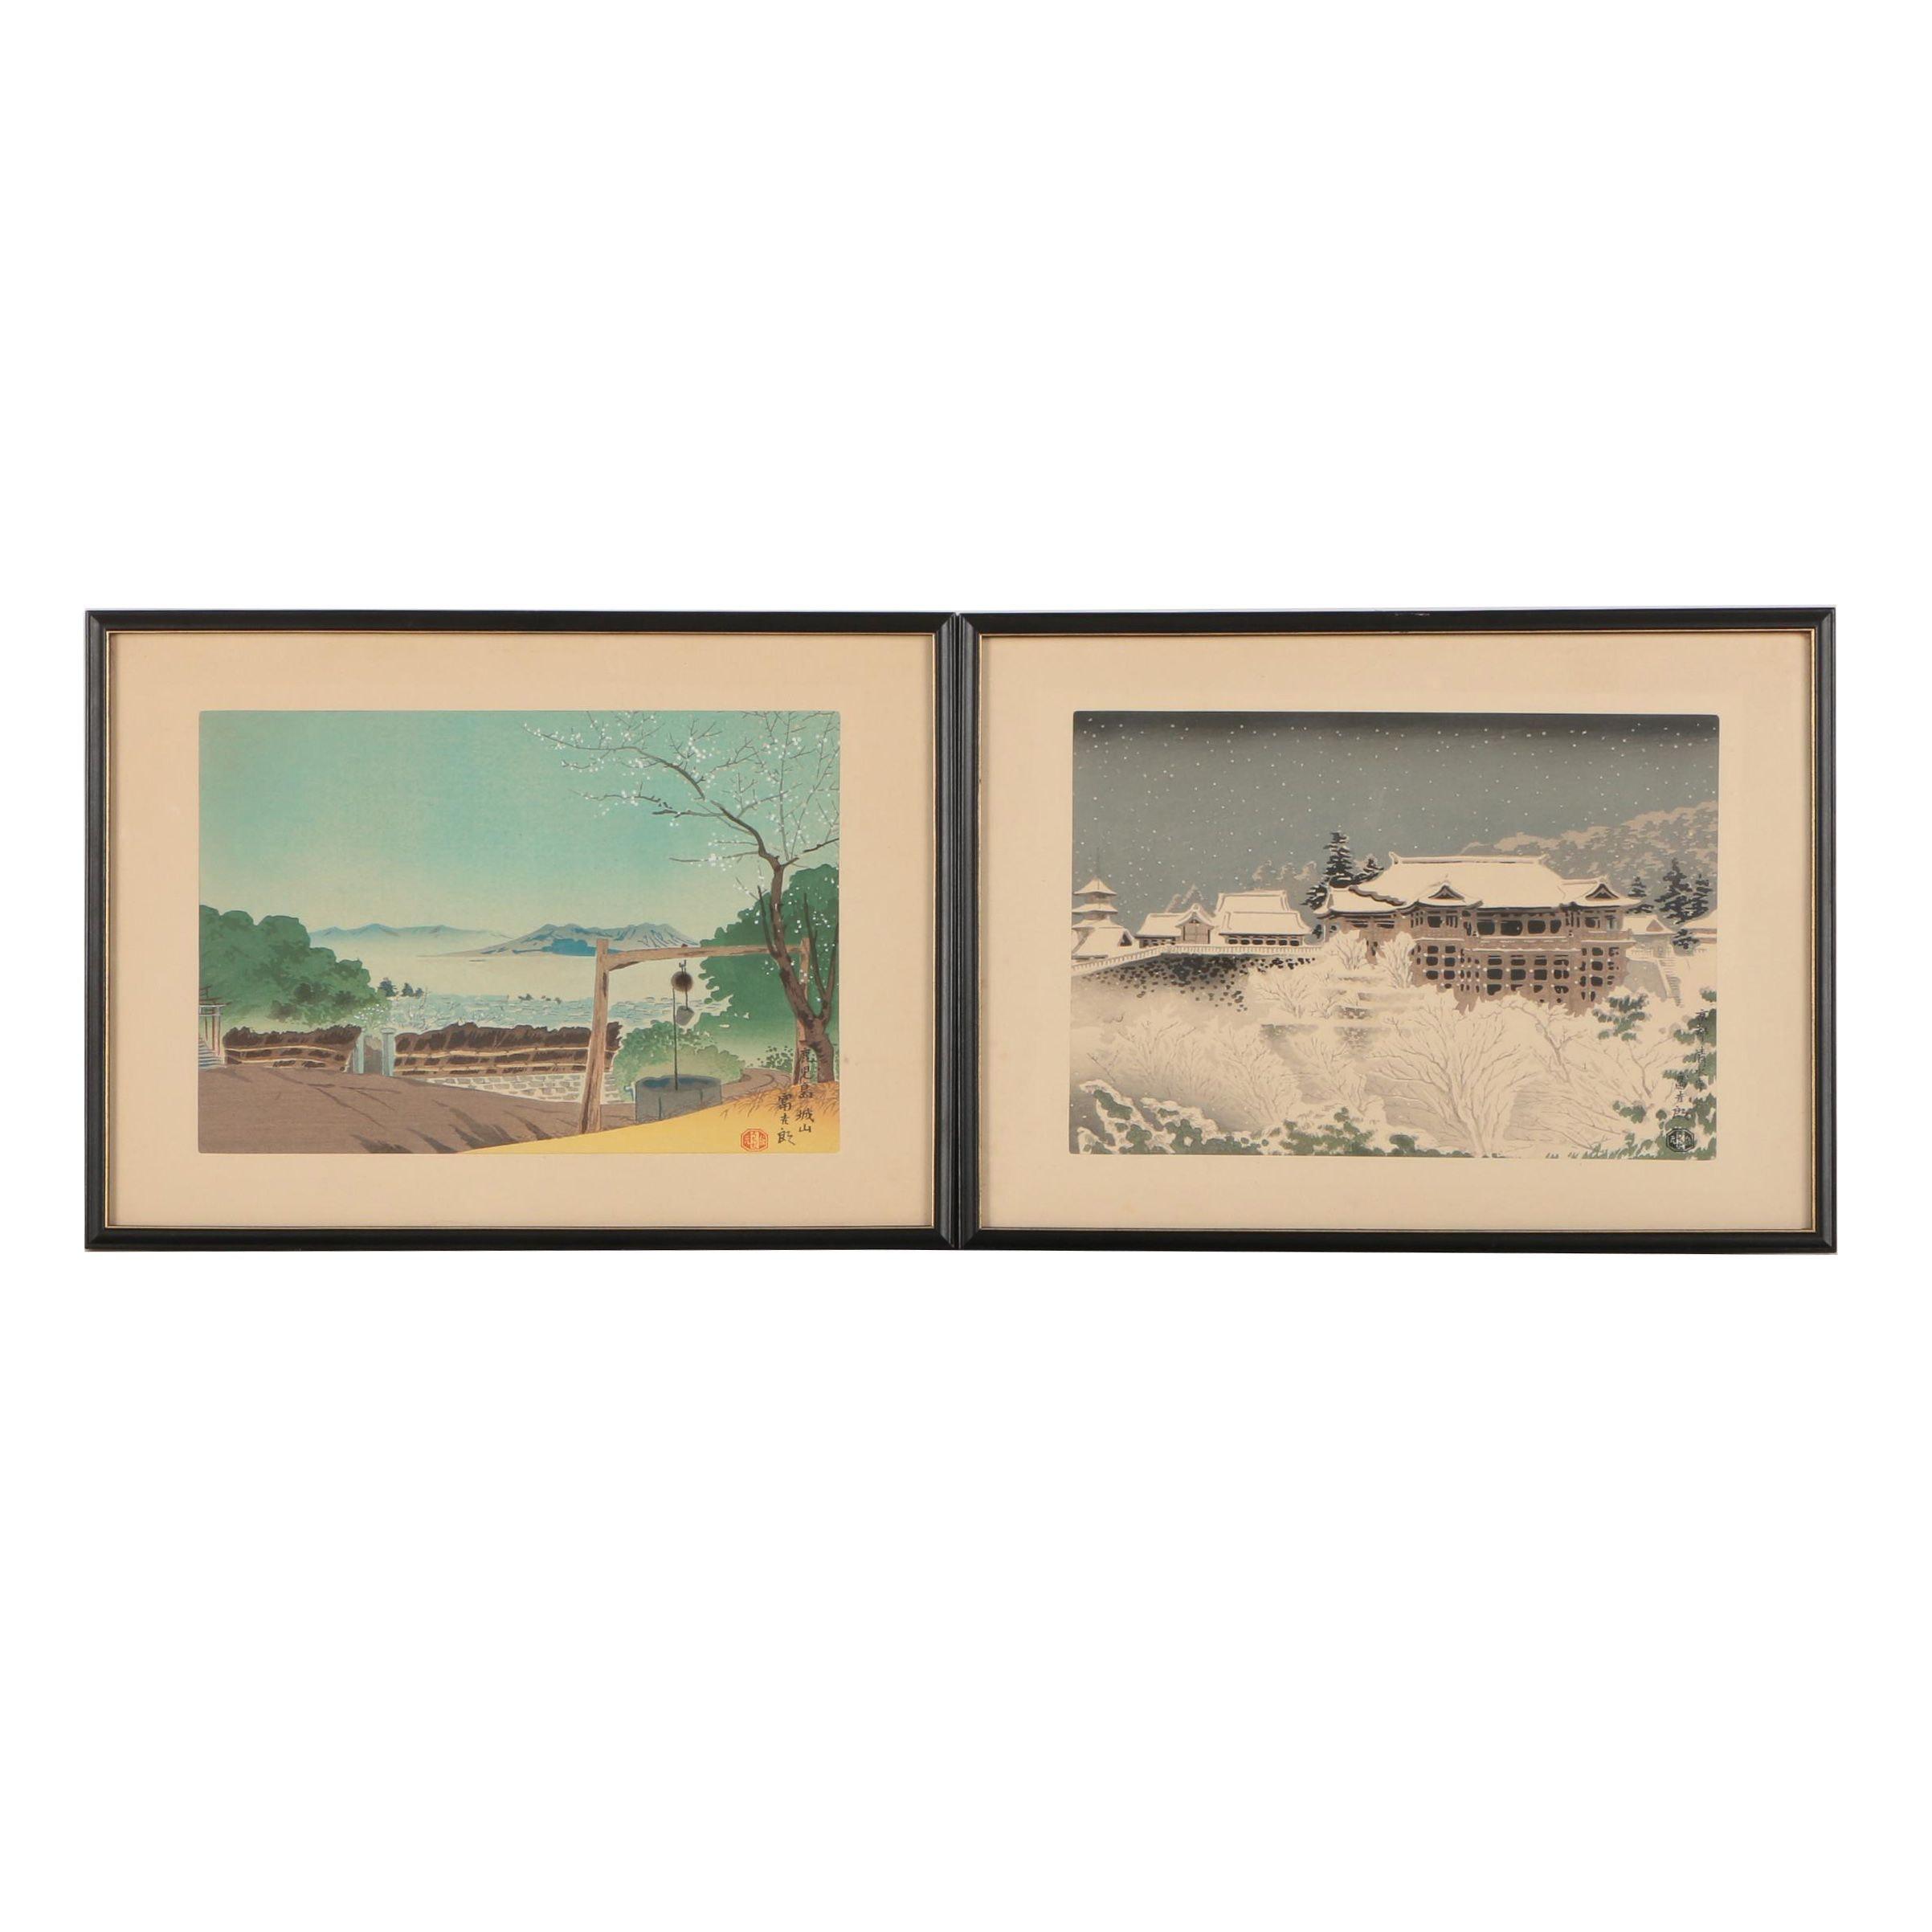 Tokuriki Tomikichirō Shin-Hanga Woodblock Prints